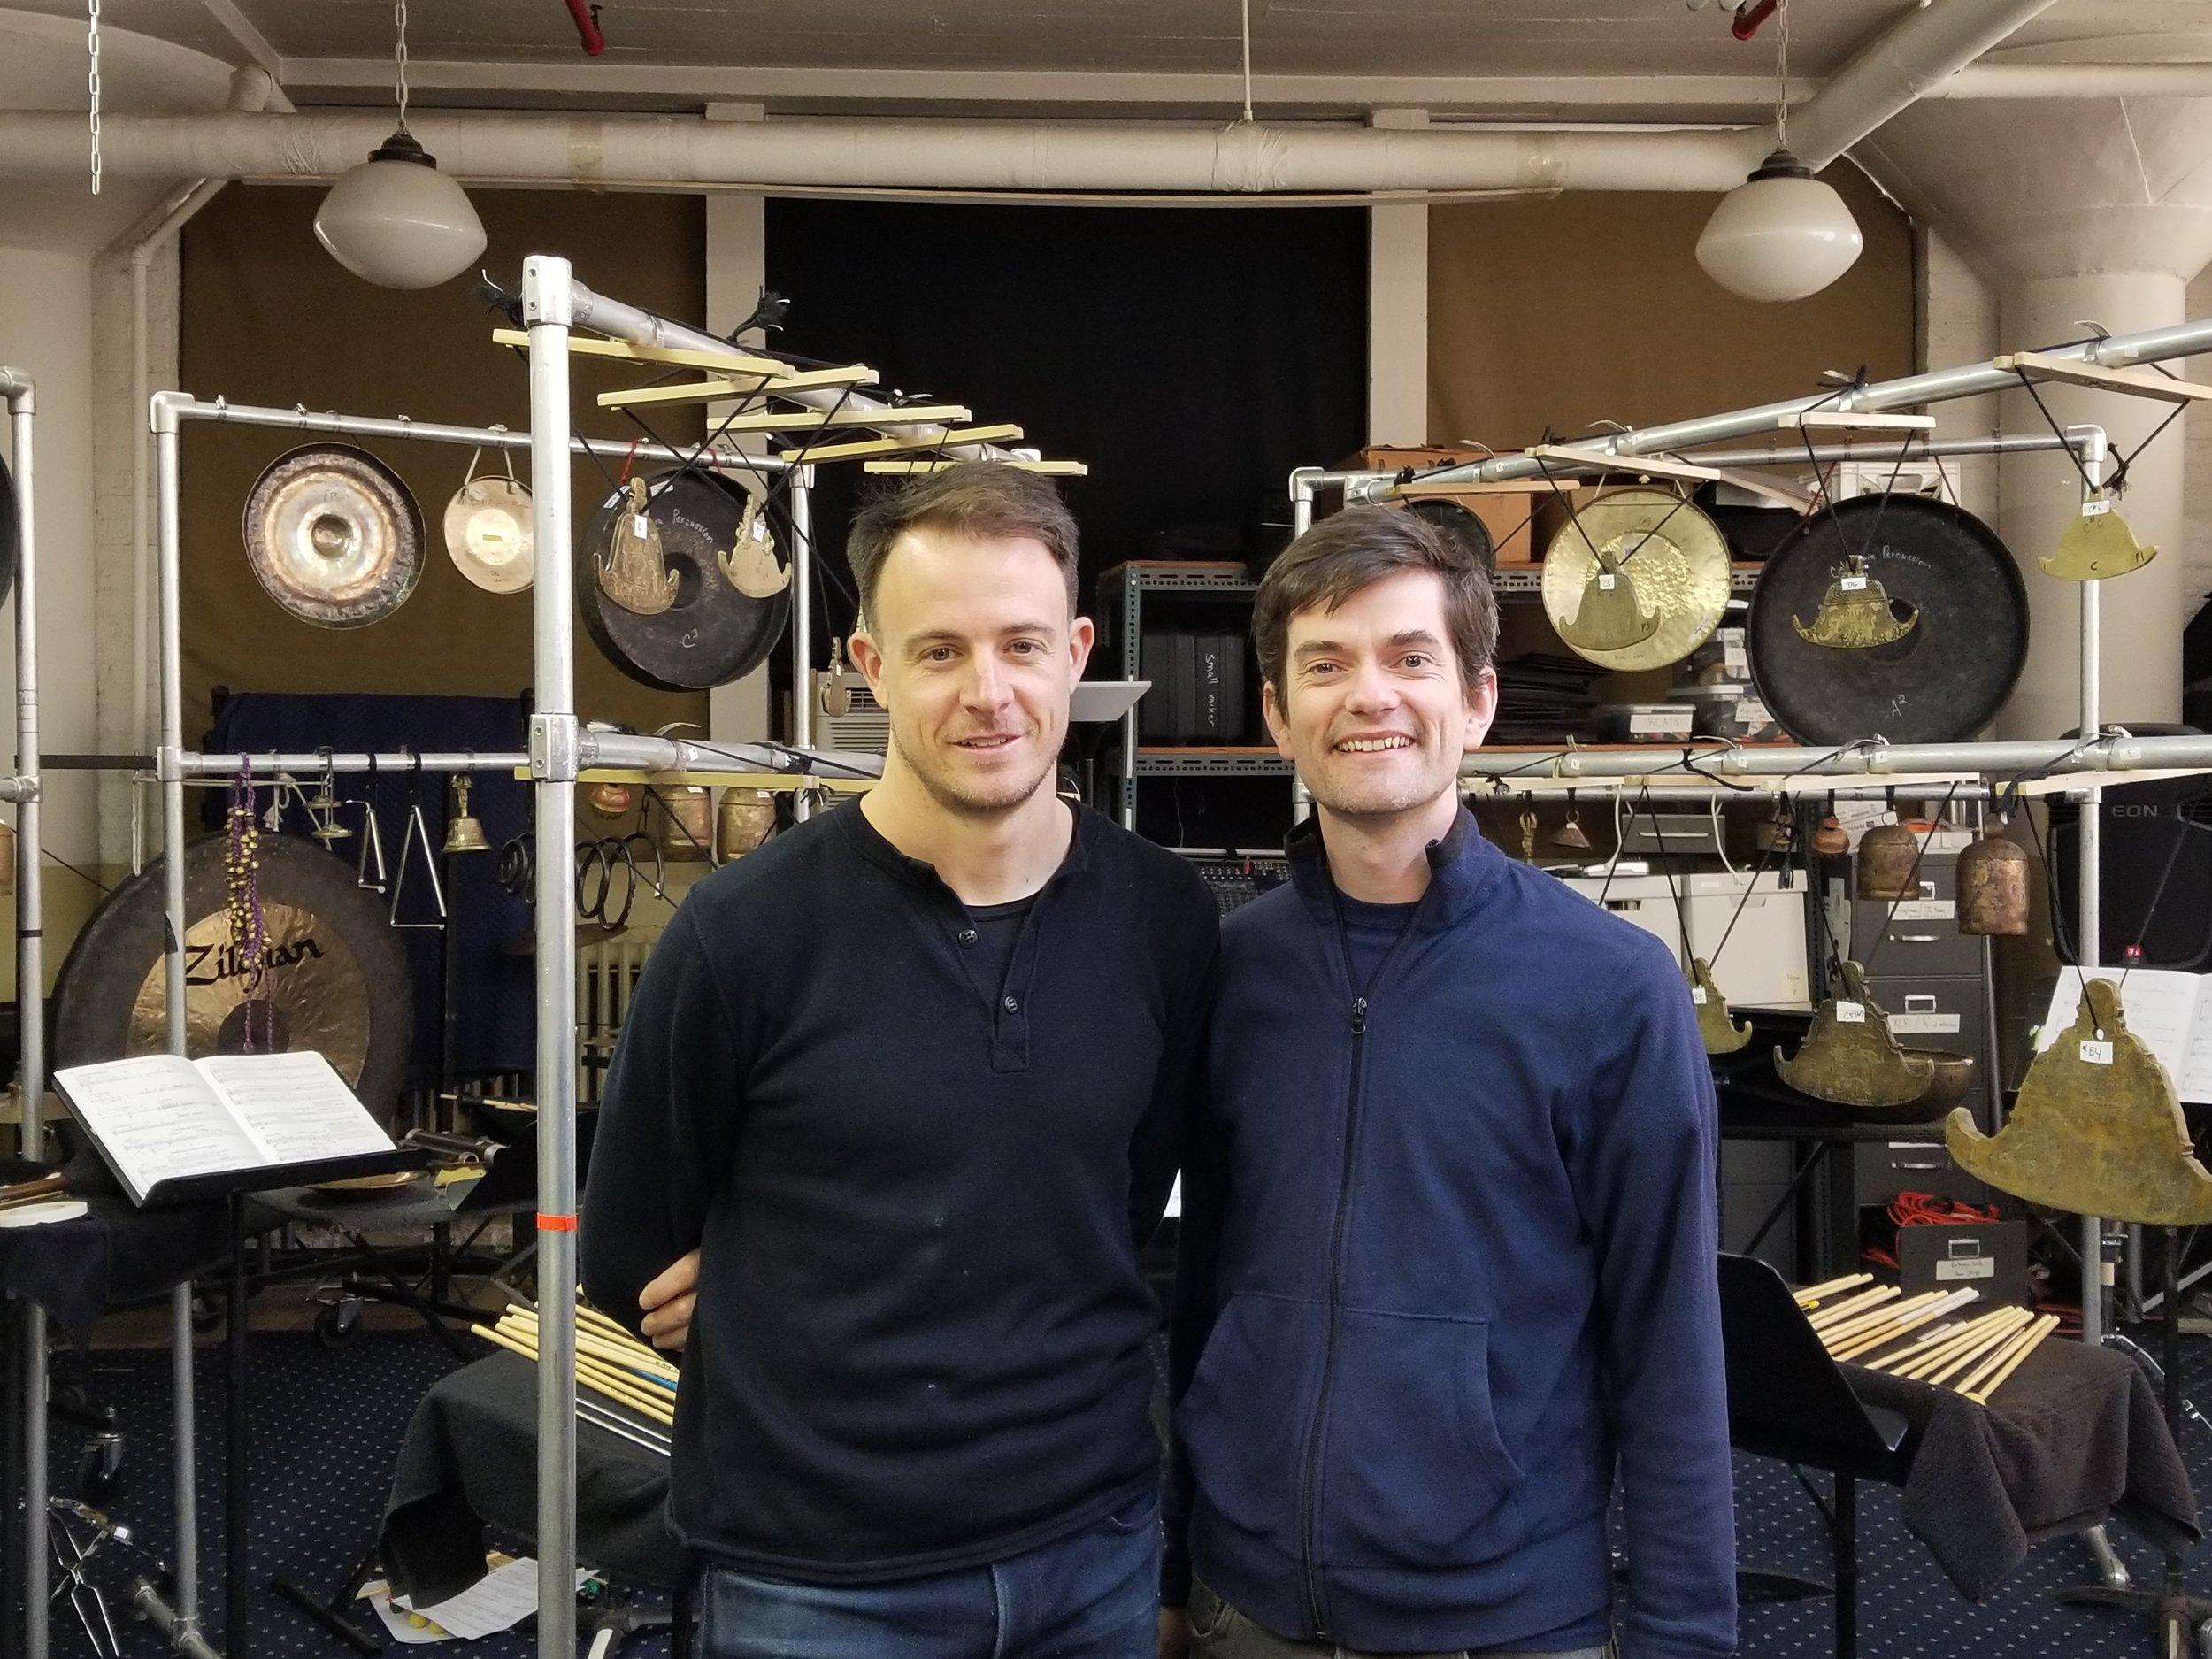 Third Coast Percussion ensemble members, David Skidmore and Sean Connors